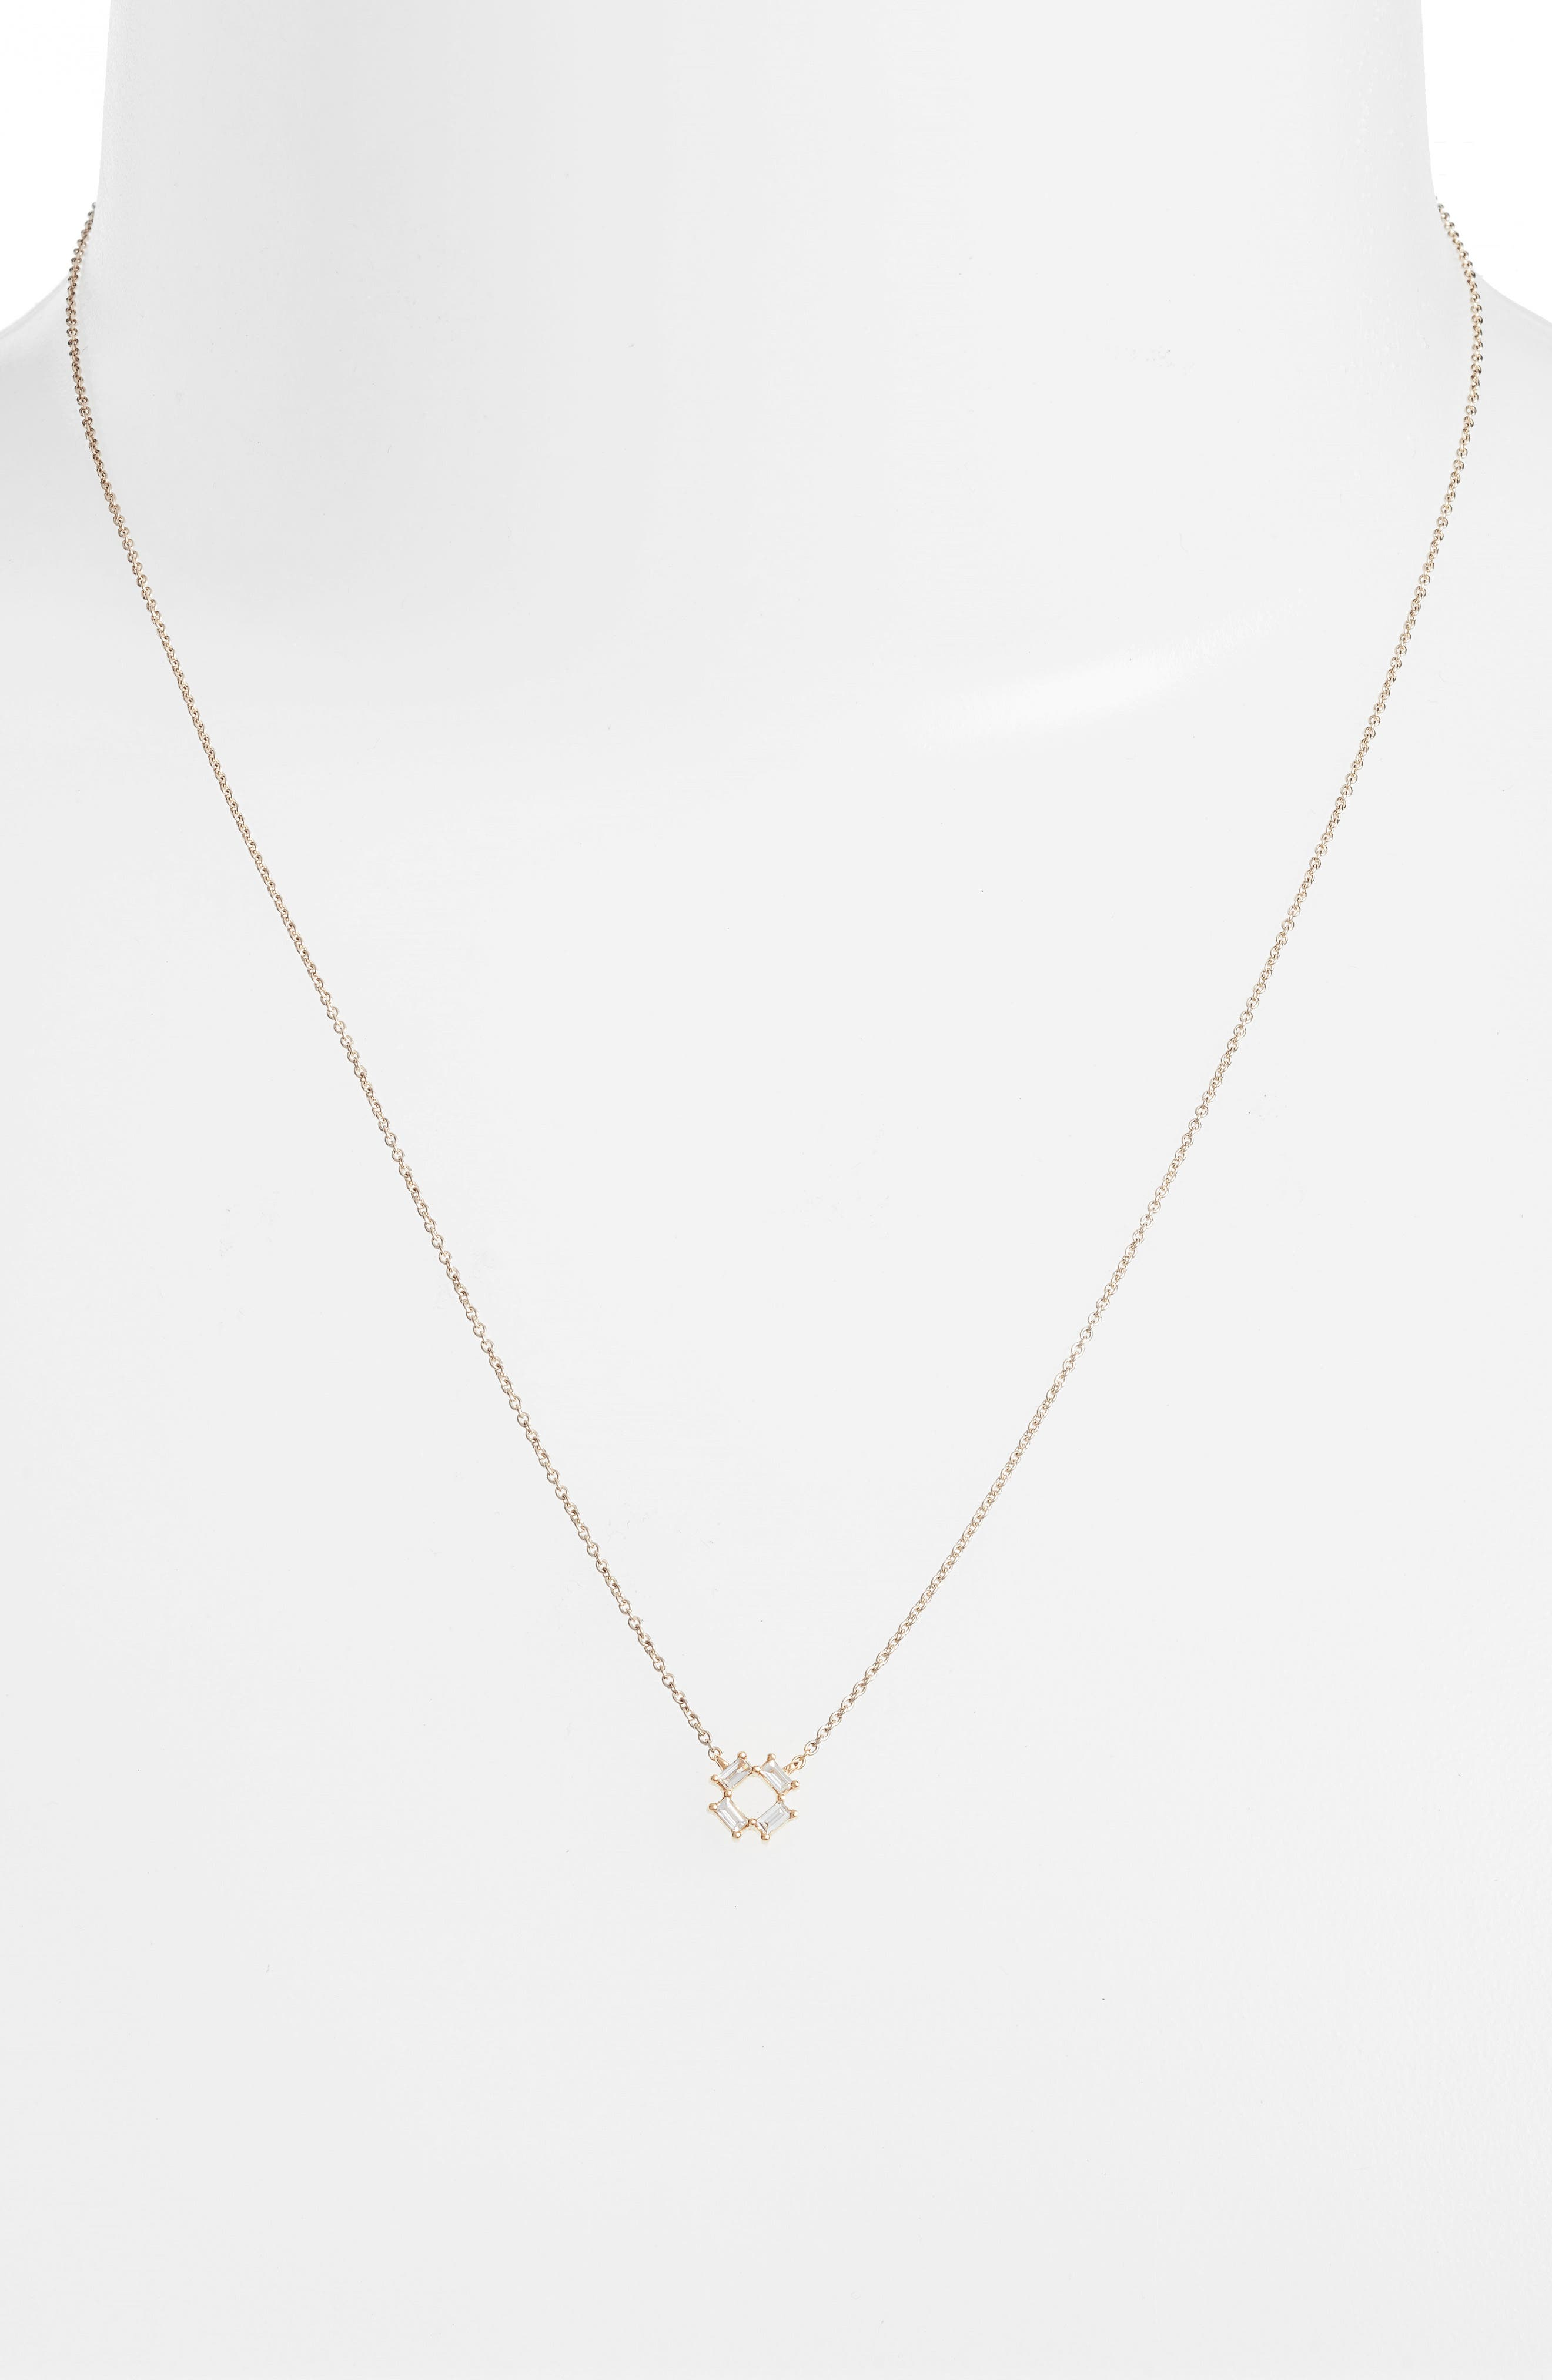 Sadie Diamond Pendant Necklace,                             Alternate thumbnail 2, color,                             YELLOW GOLD